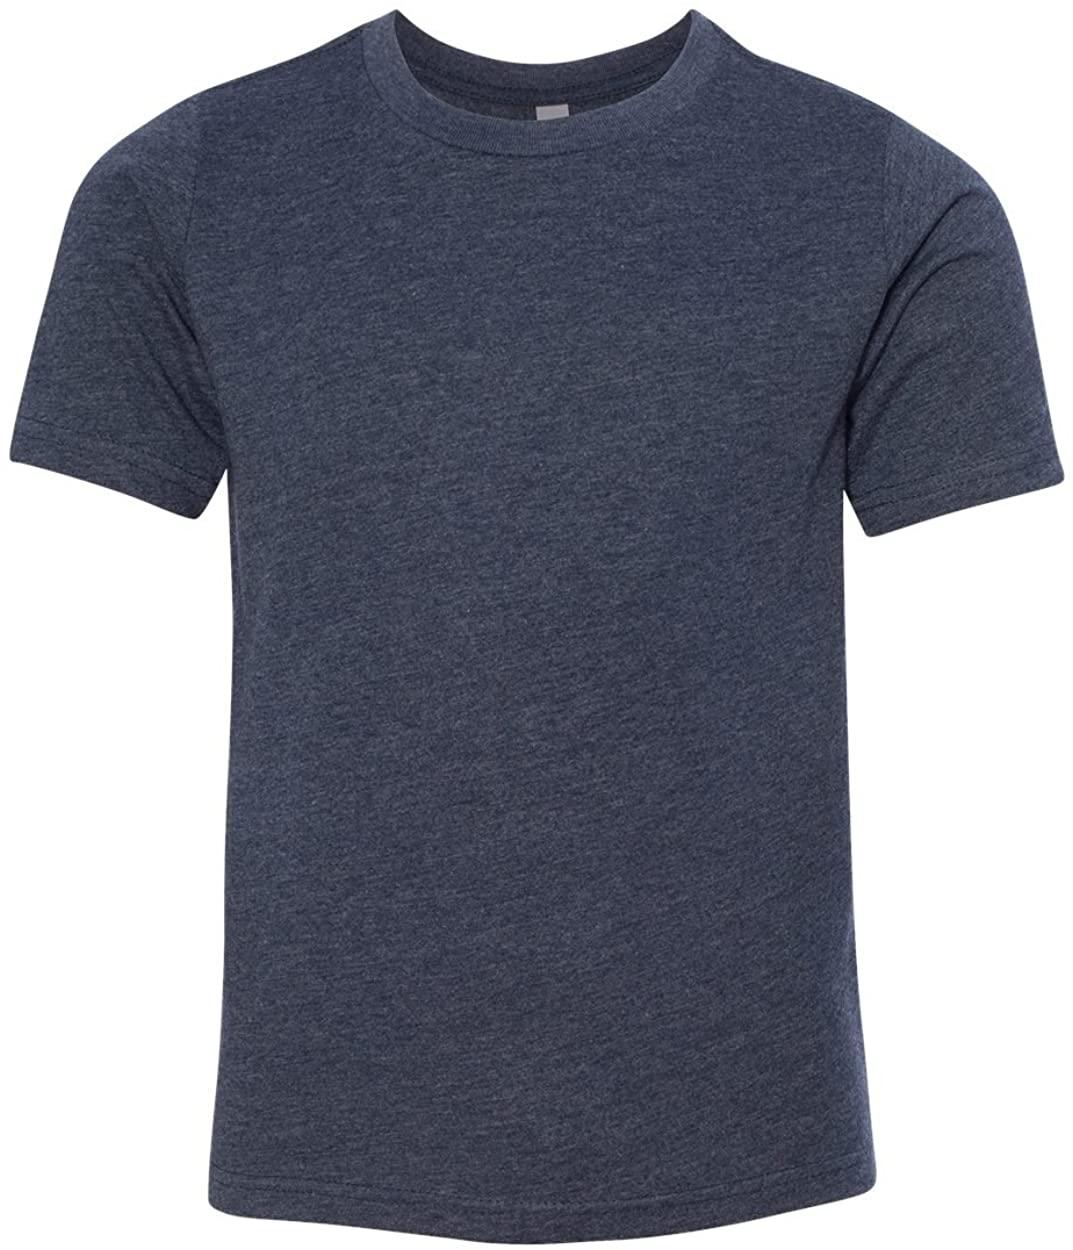 Next Level Big Boy's Crewneck Shrinkage Gorgeous T-Shirt_X-Large_Midnight Navy